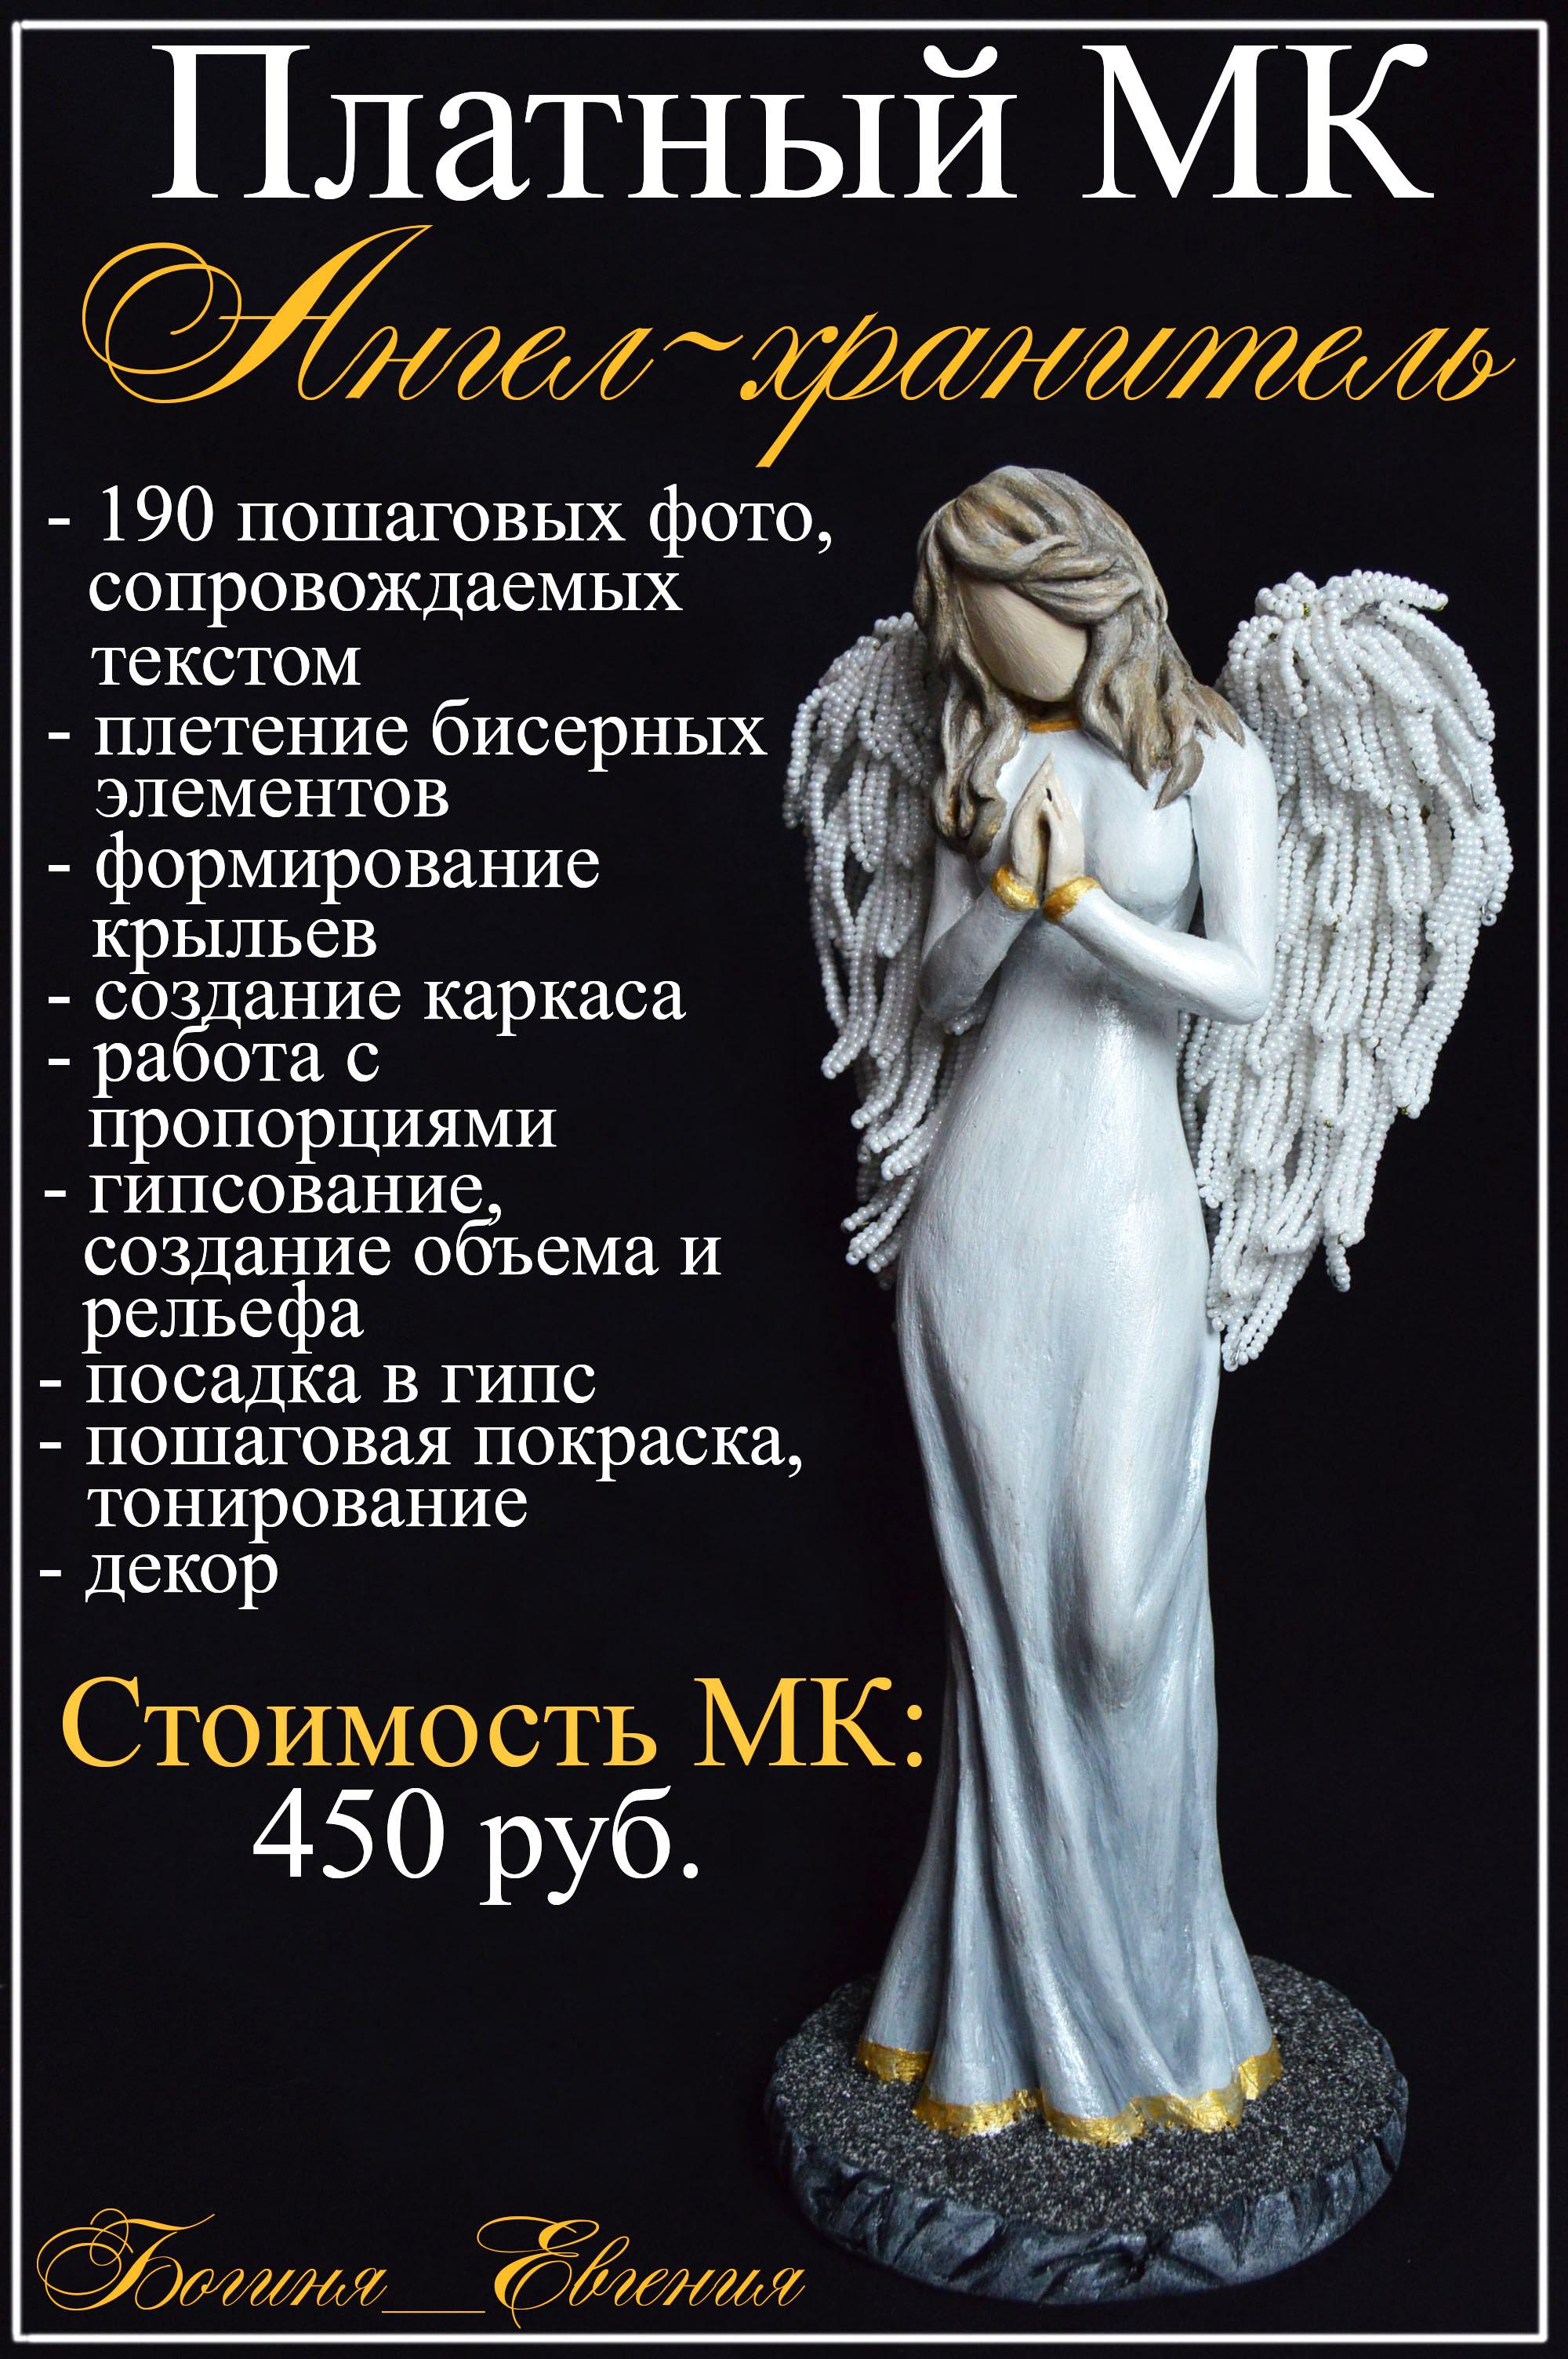 platnyj-mk-novoe